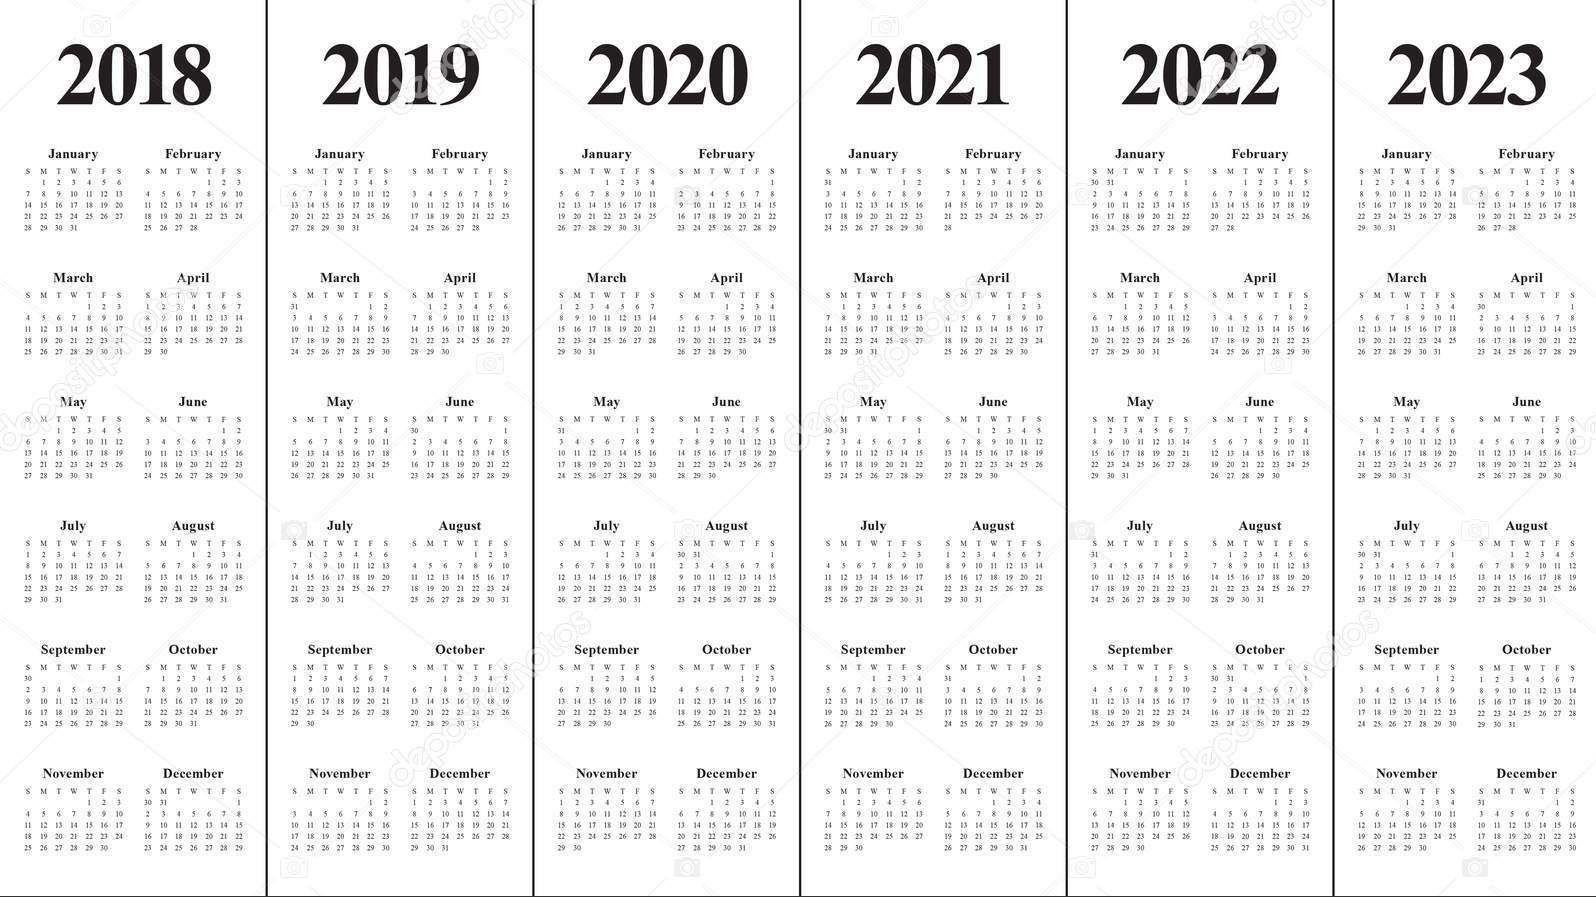 Create Your Printable Multi Year Calendars On One Page | Get Your Calendar Printable throughout Sample One Page Multi Year Calendars Image